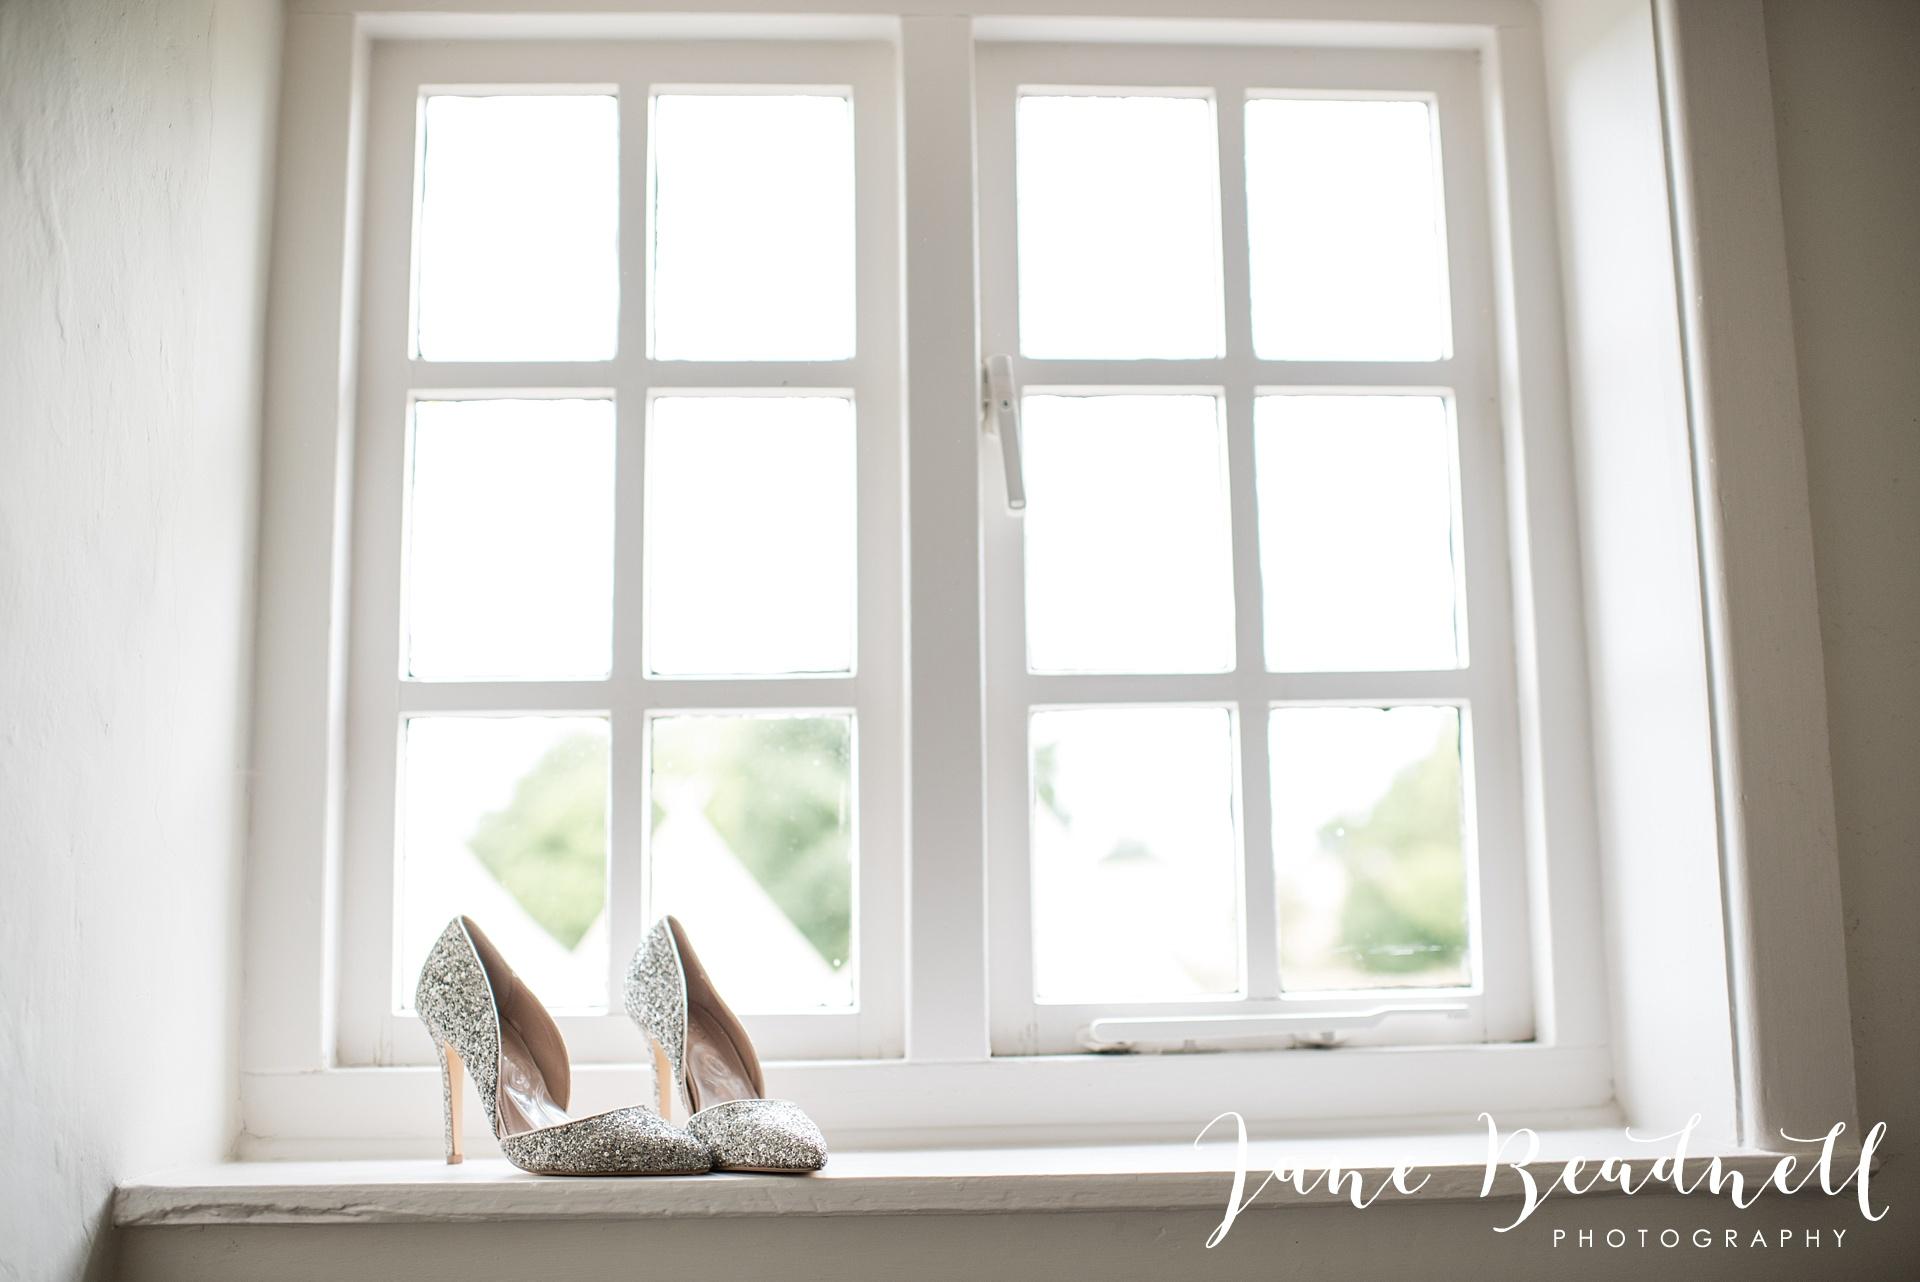 fine-art-wedding-photographer-jane-beadnell-yorkshire-wedding-photographer_0028